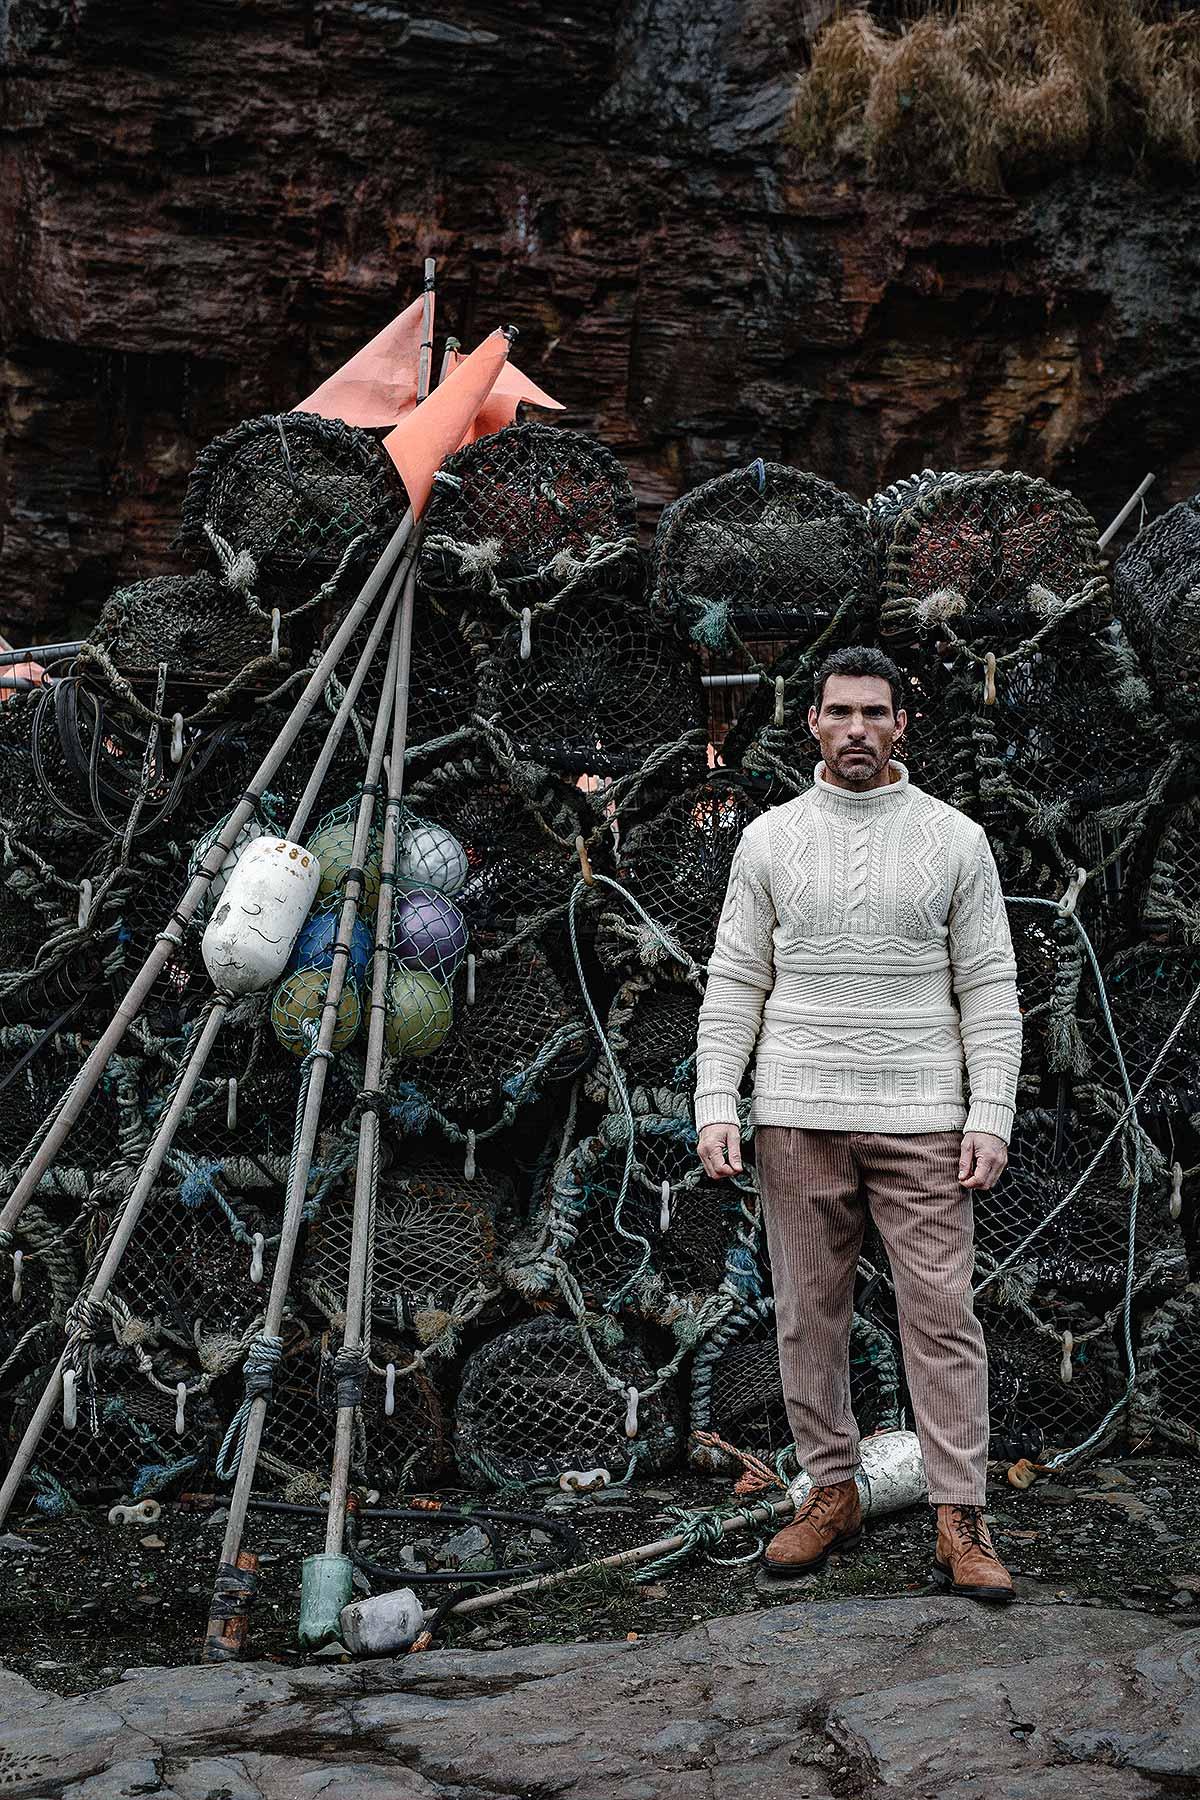 man wearing jumper next to nets